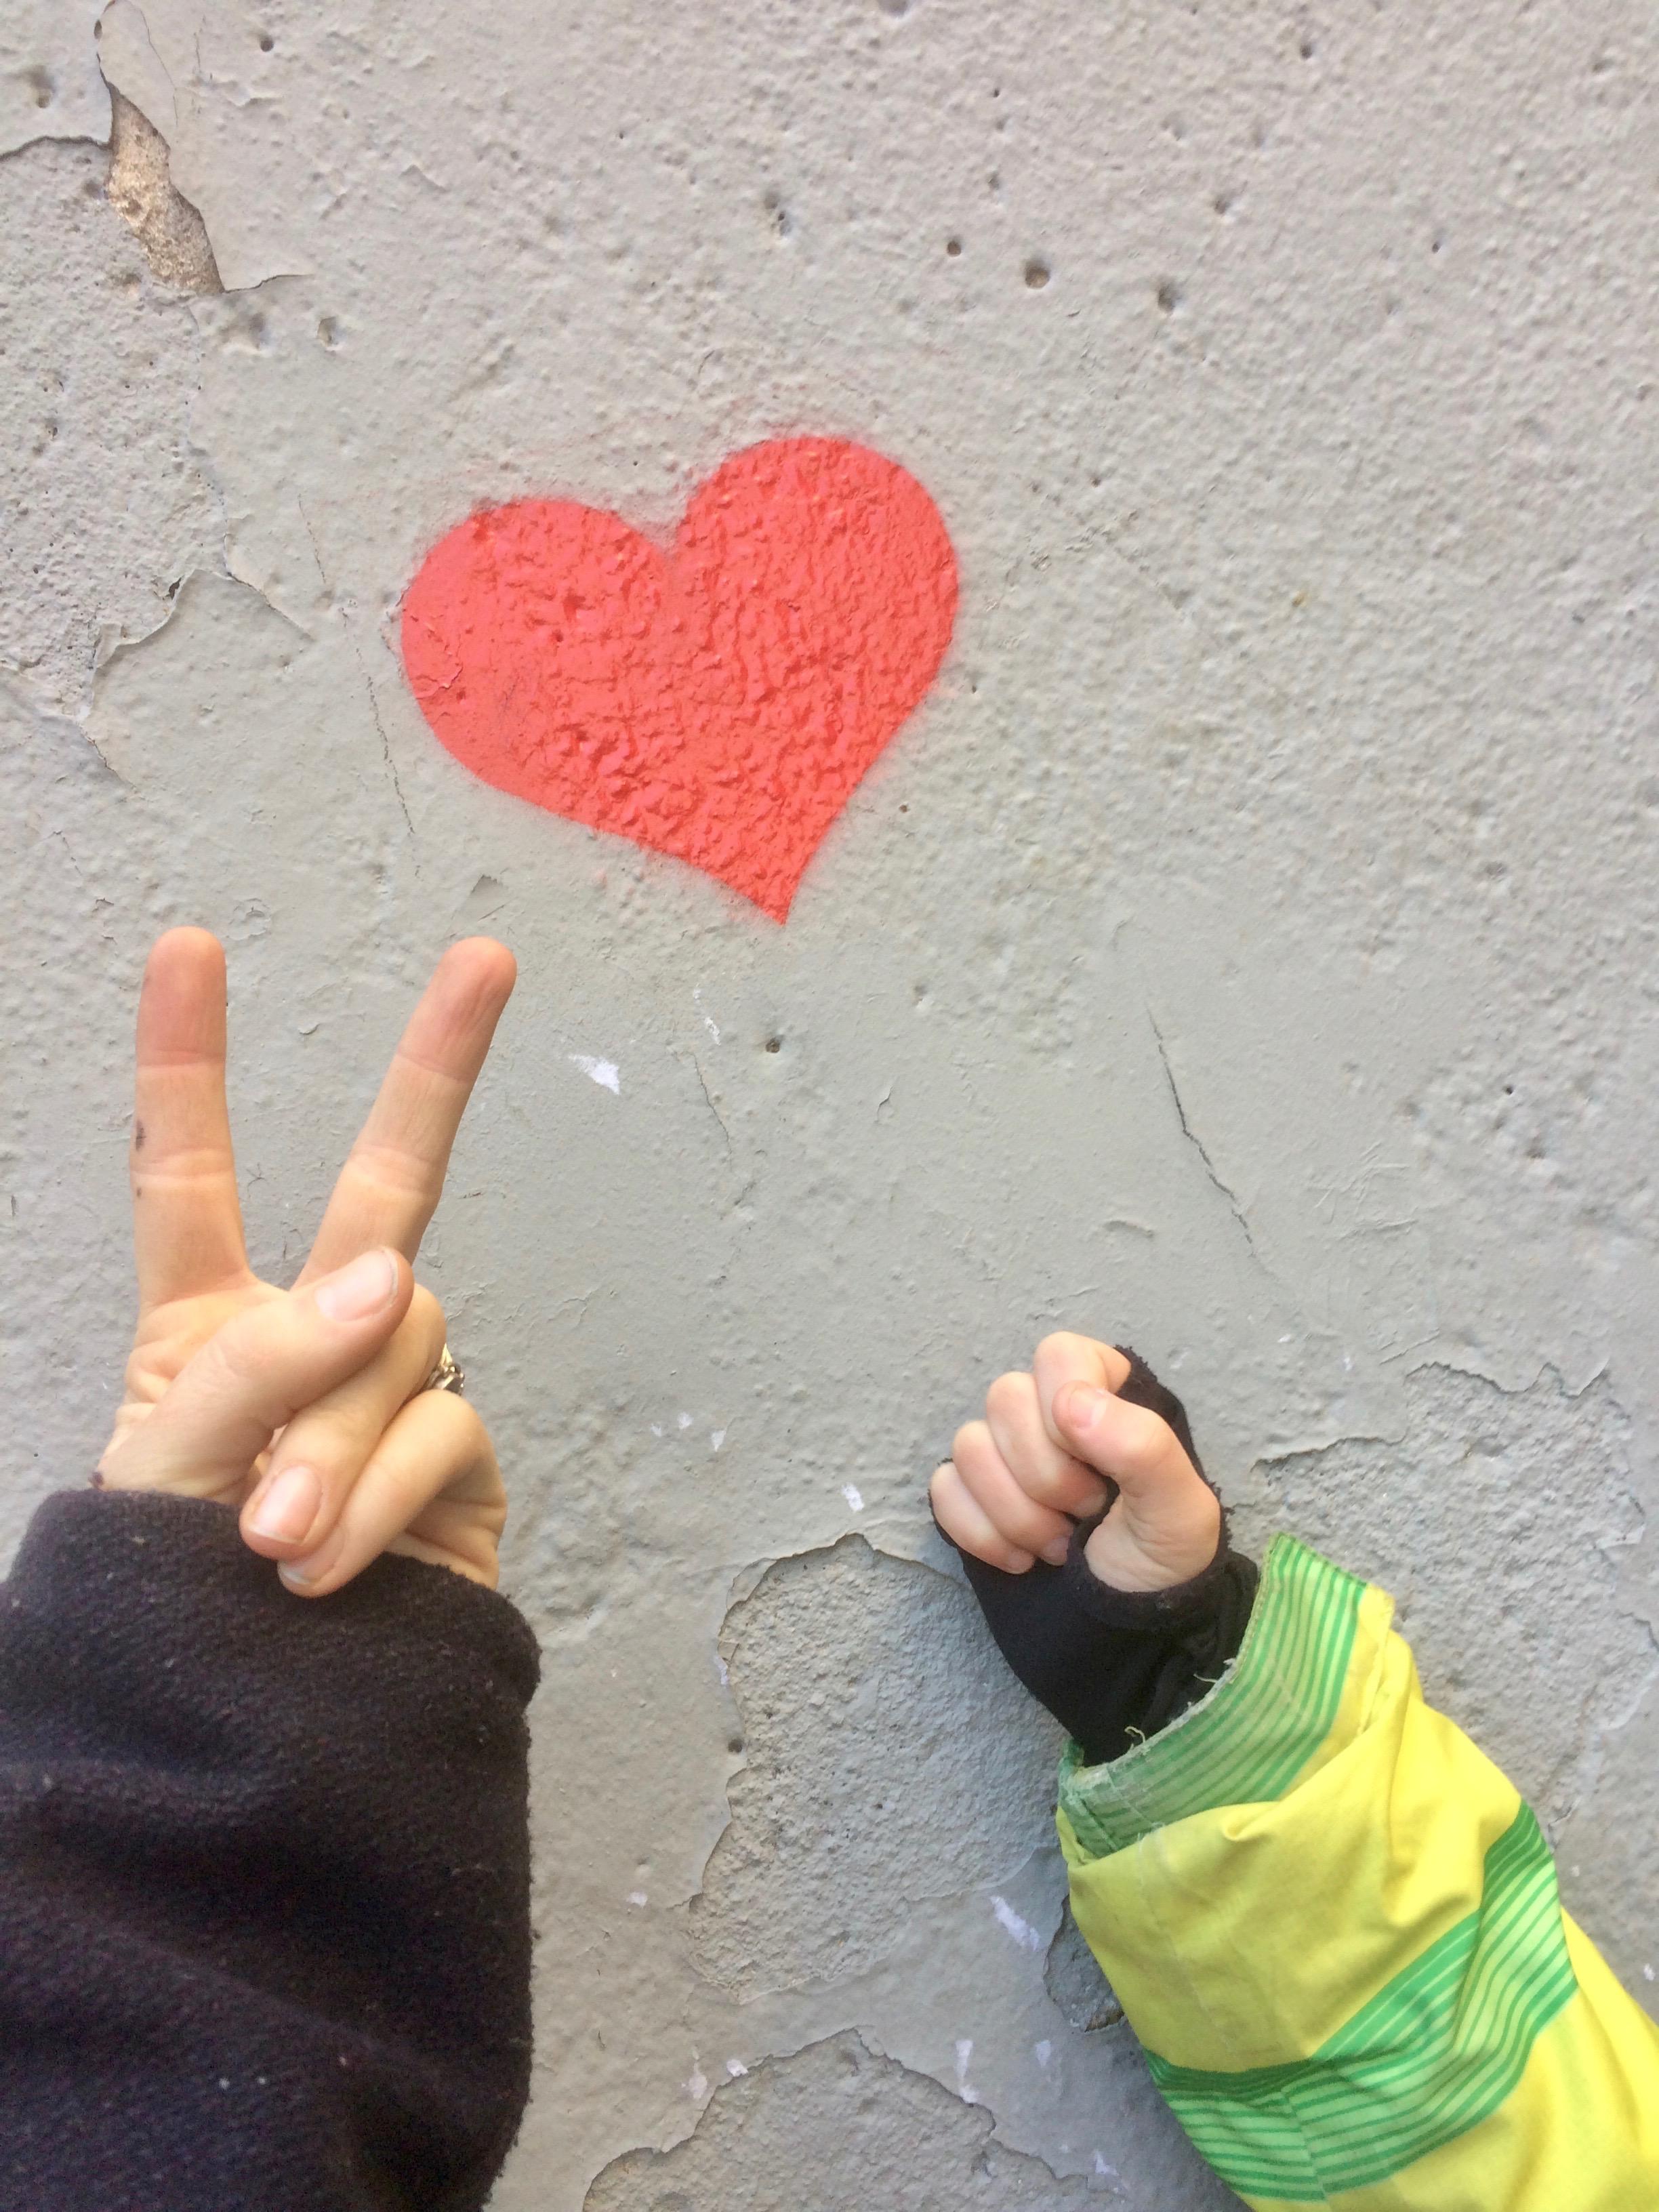 peace_love_resistance_Paris_December_2017.jpg